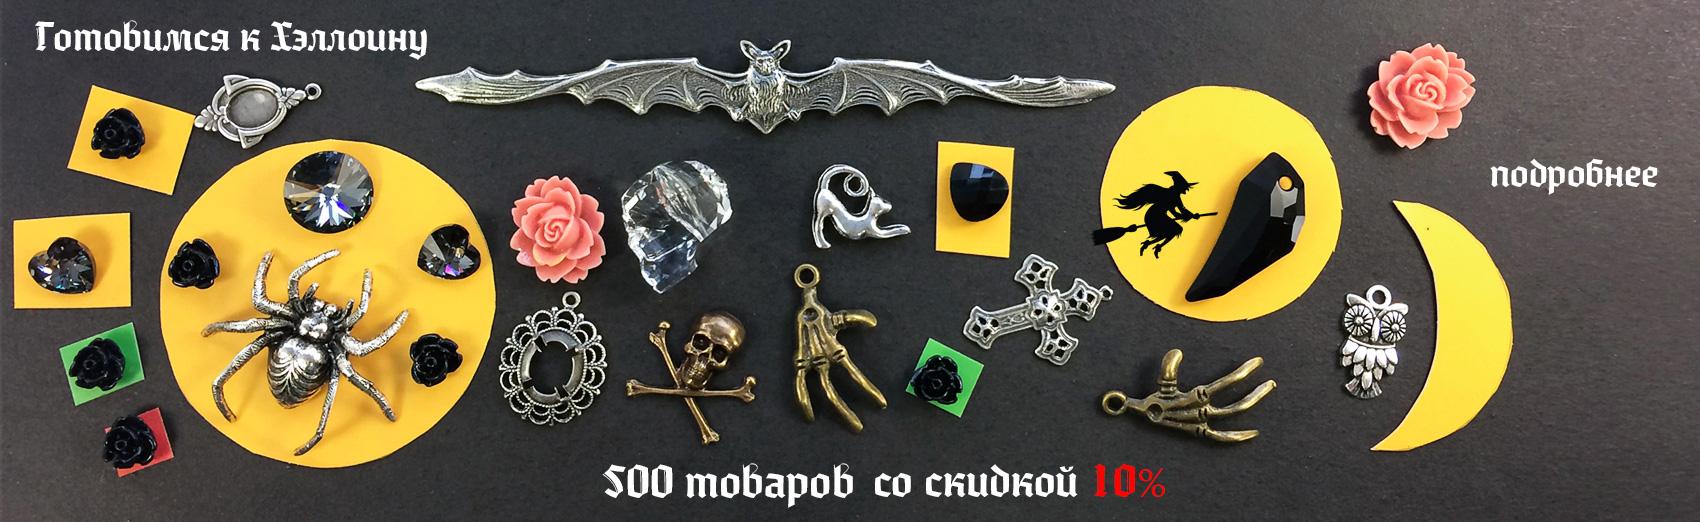 Фурнитура для бижутерии к Хэллоуину